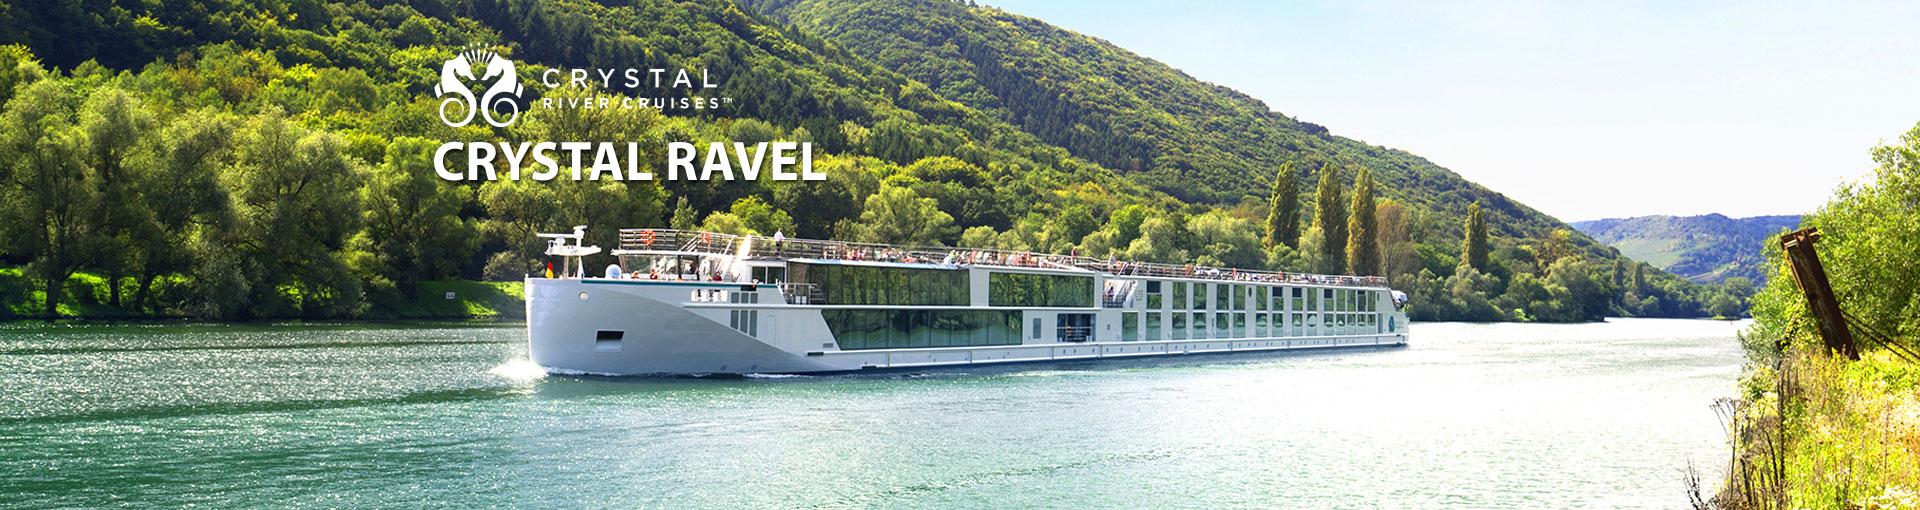 Crystal Ravel River Ship